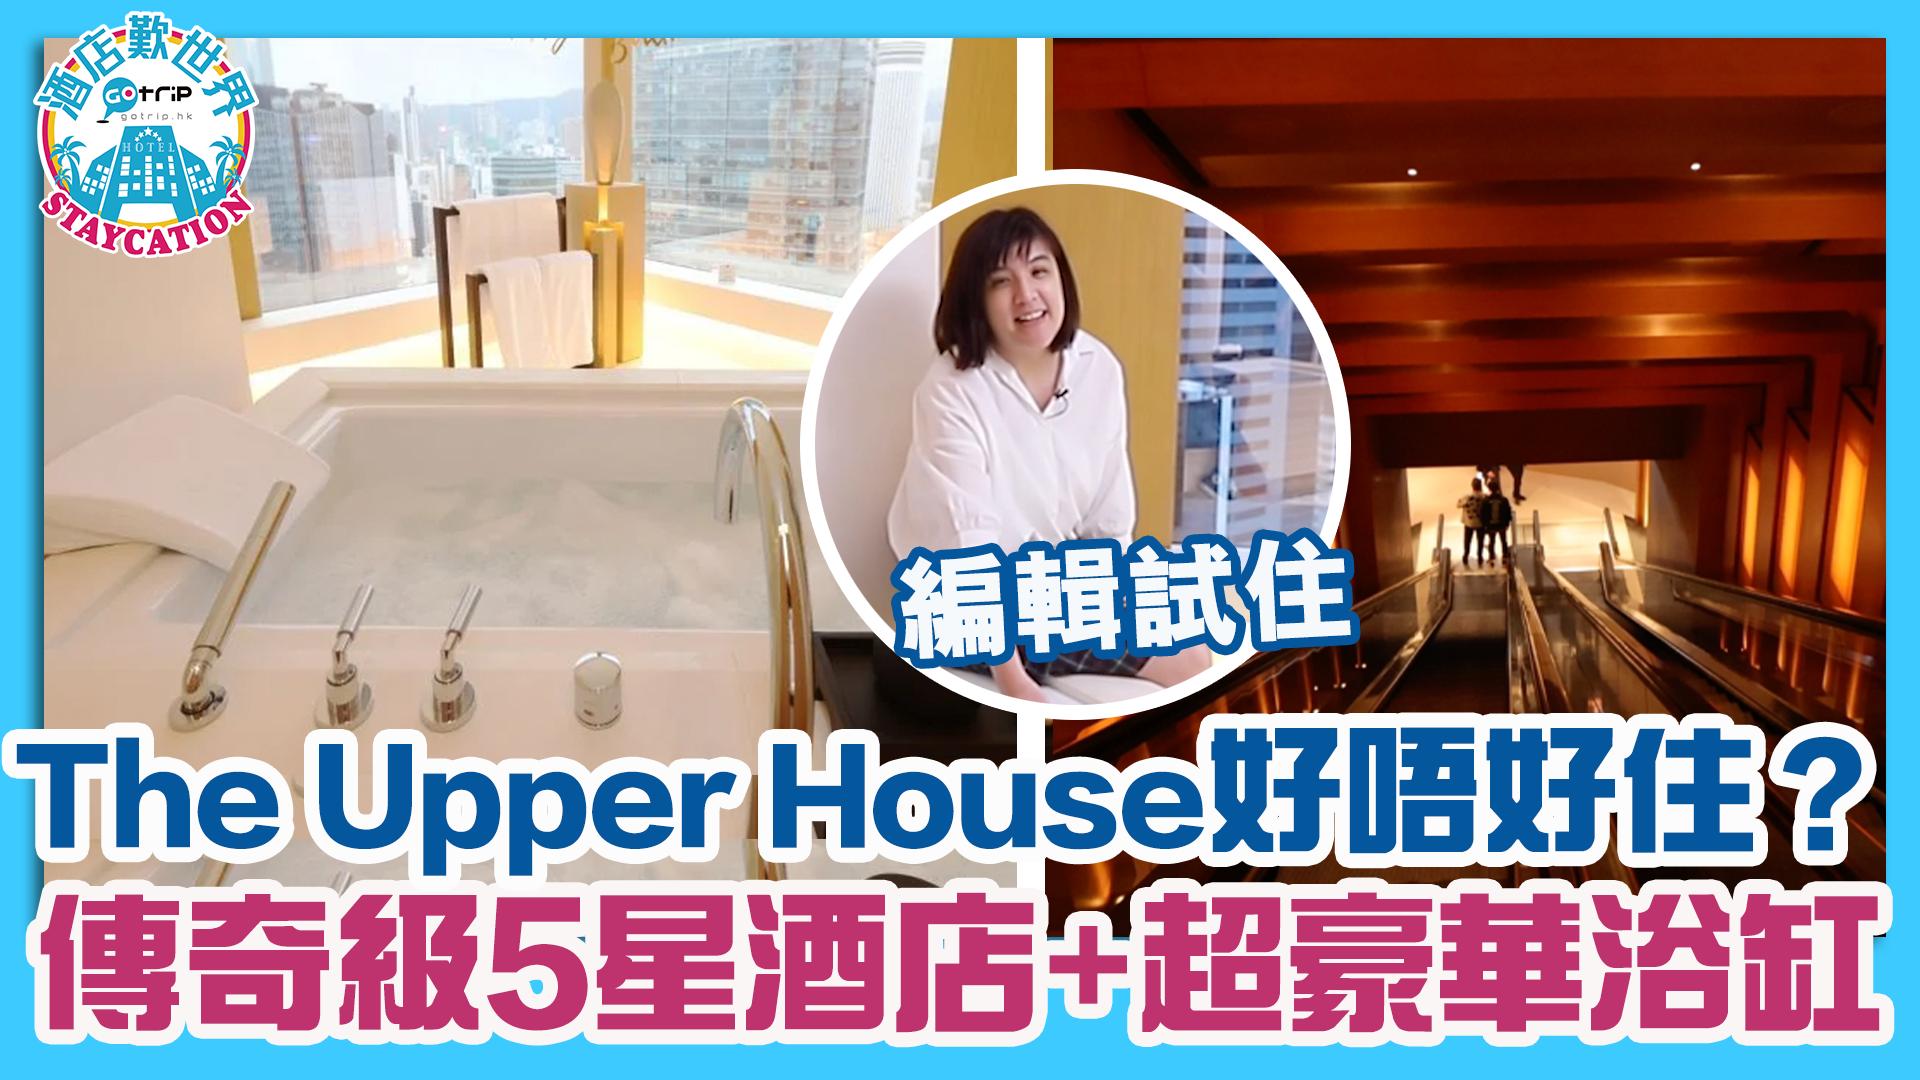 The Upper House入住報告 城中隱世奢華5星酒店、打卡必浸巨大浴缸 GOtrip酒店歎世界